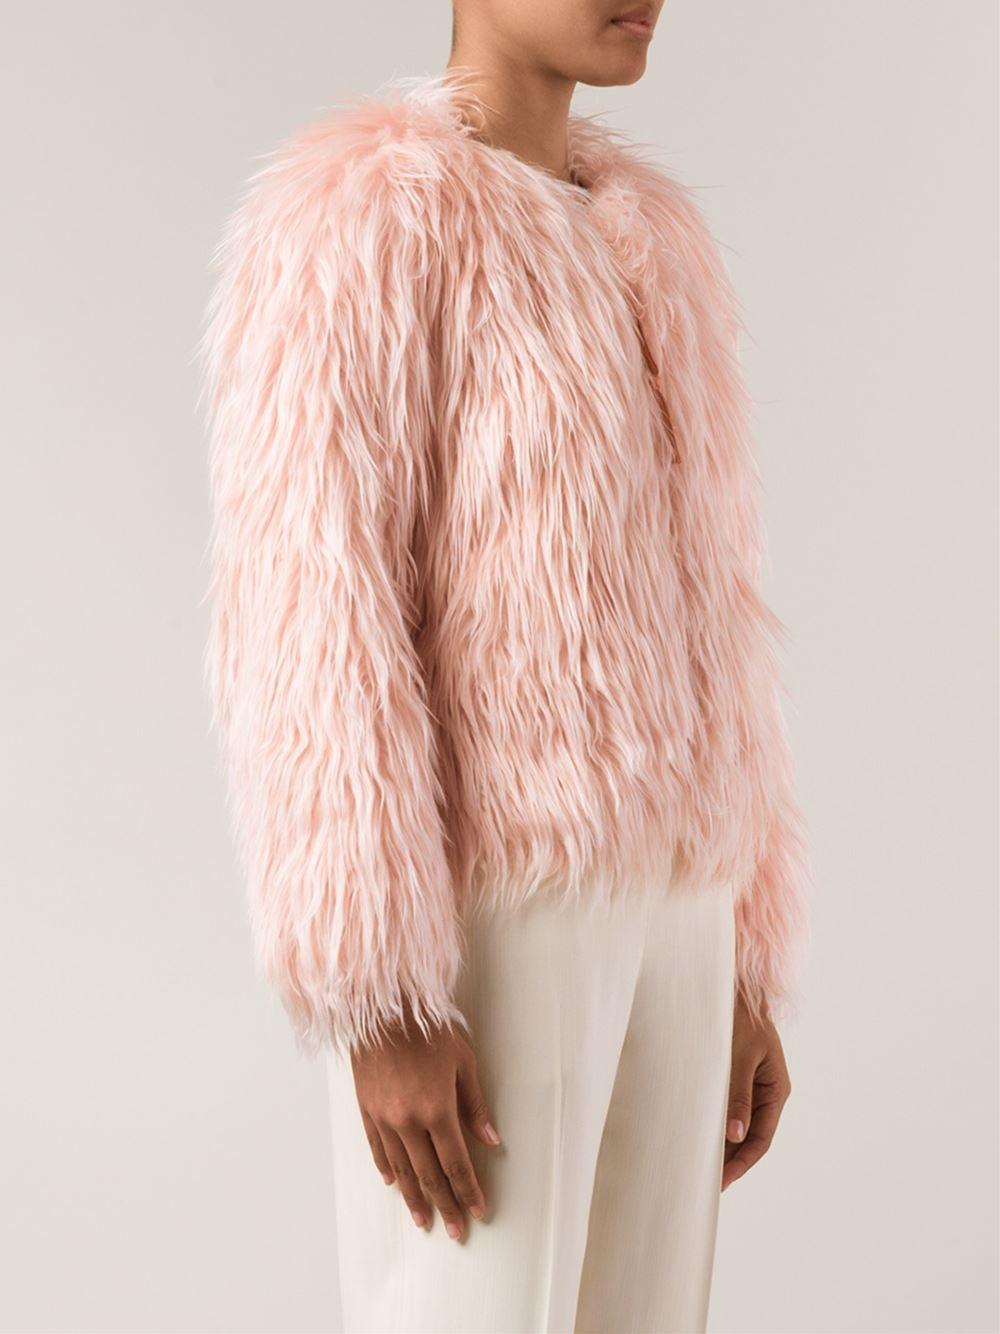 COACH Cropped Fluffy Jacket in Pink & Purple (Pink) - Lyst   1000 x 1334 jpeg 410kB